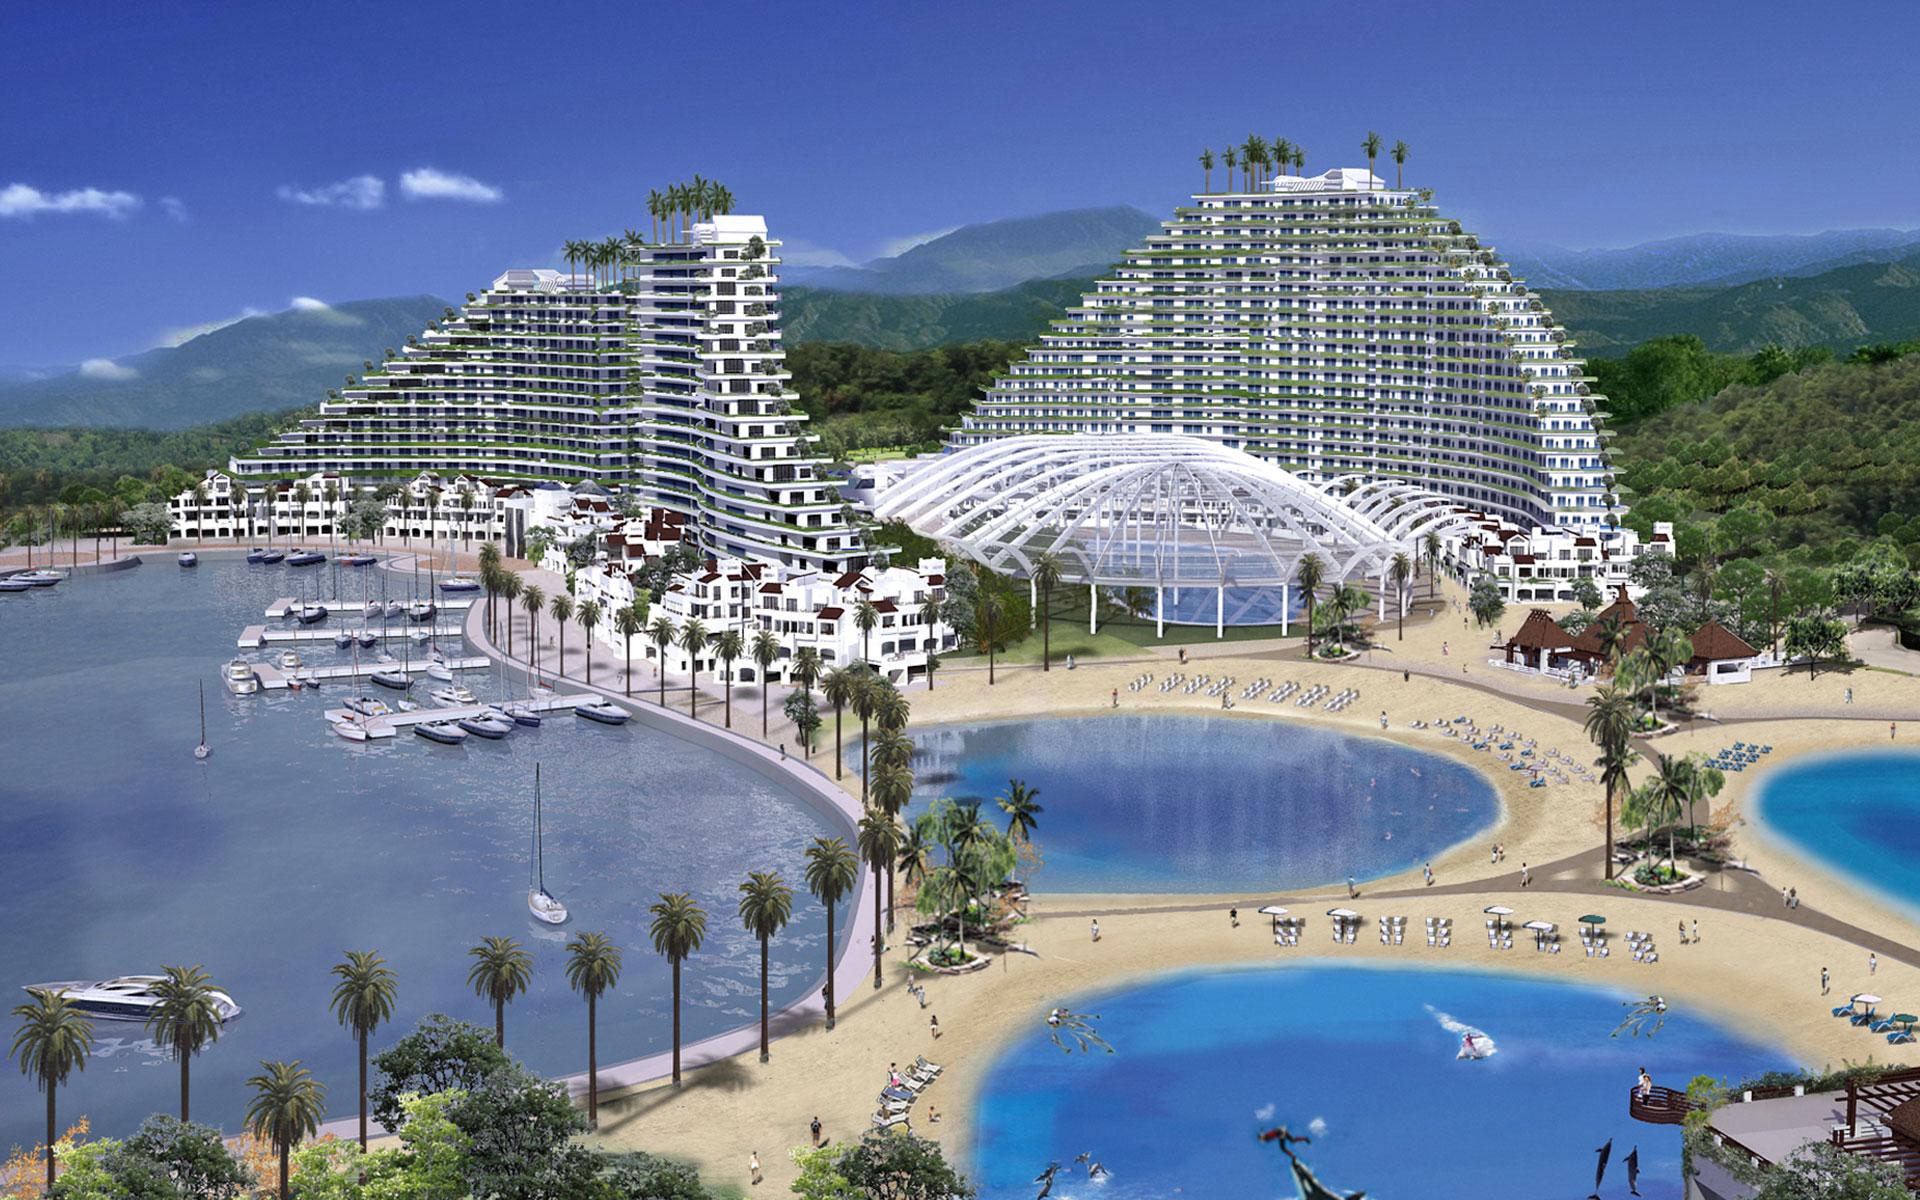 Architects in Marbella Villarroeltorrico, Architecture and Landscape